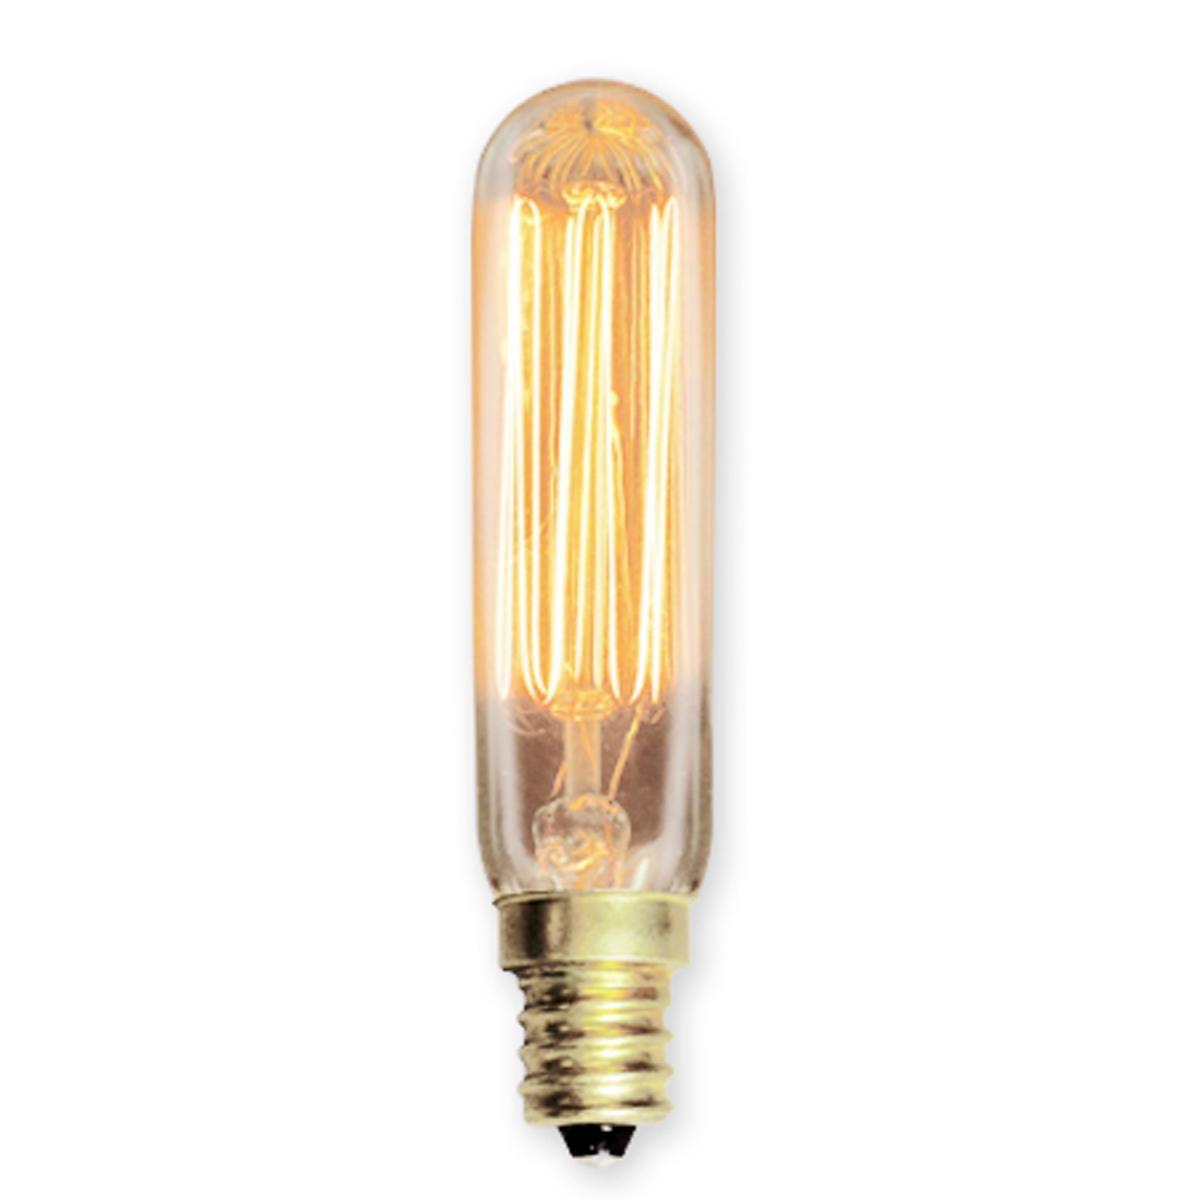 25 Watt Mini Tubular Vintage Edison Bulb Candle Base Vintage Edison Bulbs Candle Base Antique Light Bulbs